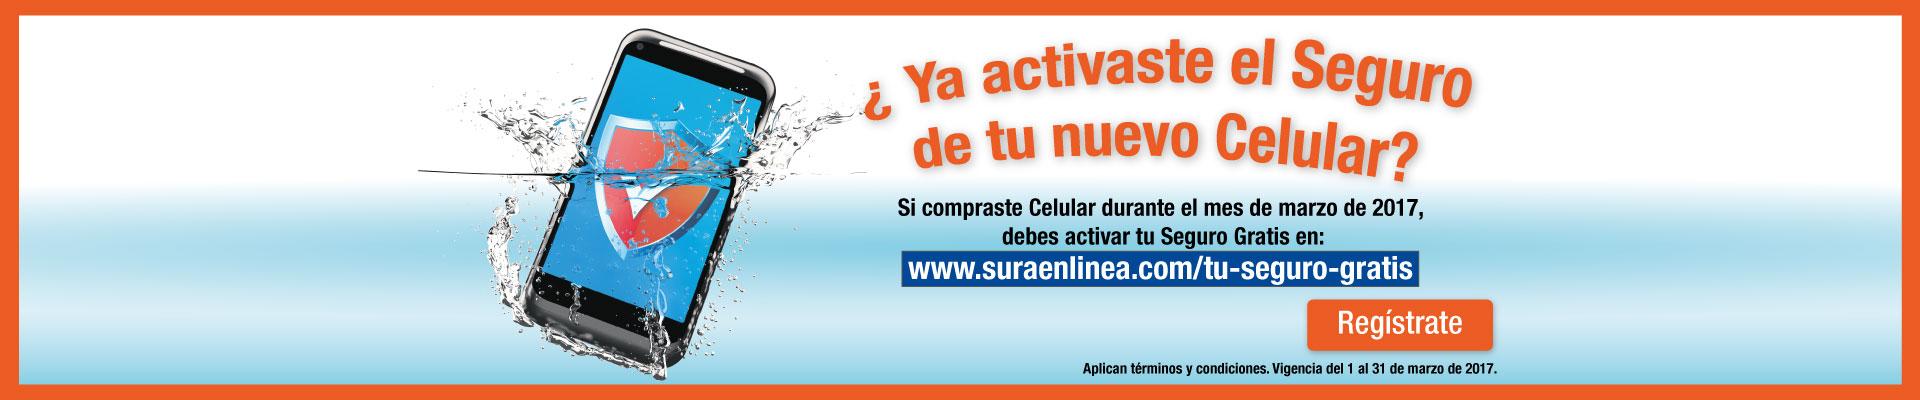 Bppal AK - Activa Seguro Gratis Celulares - Mar29